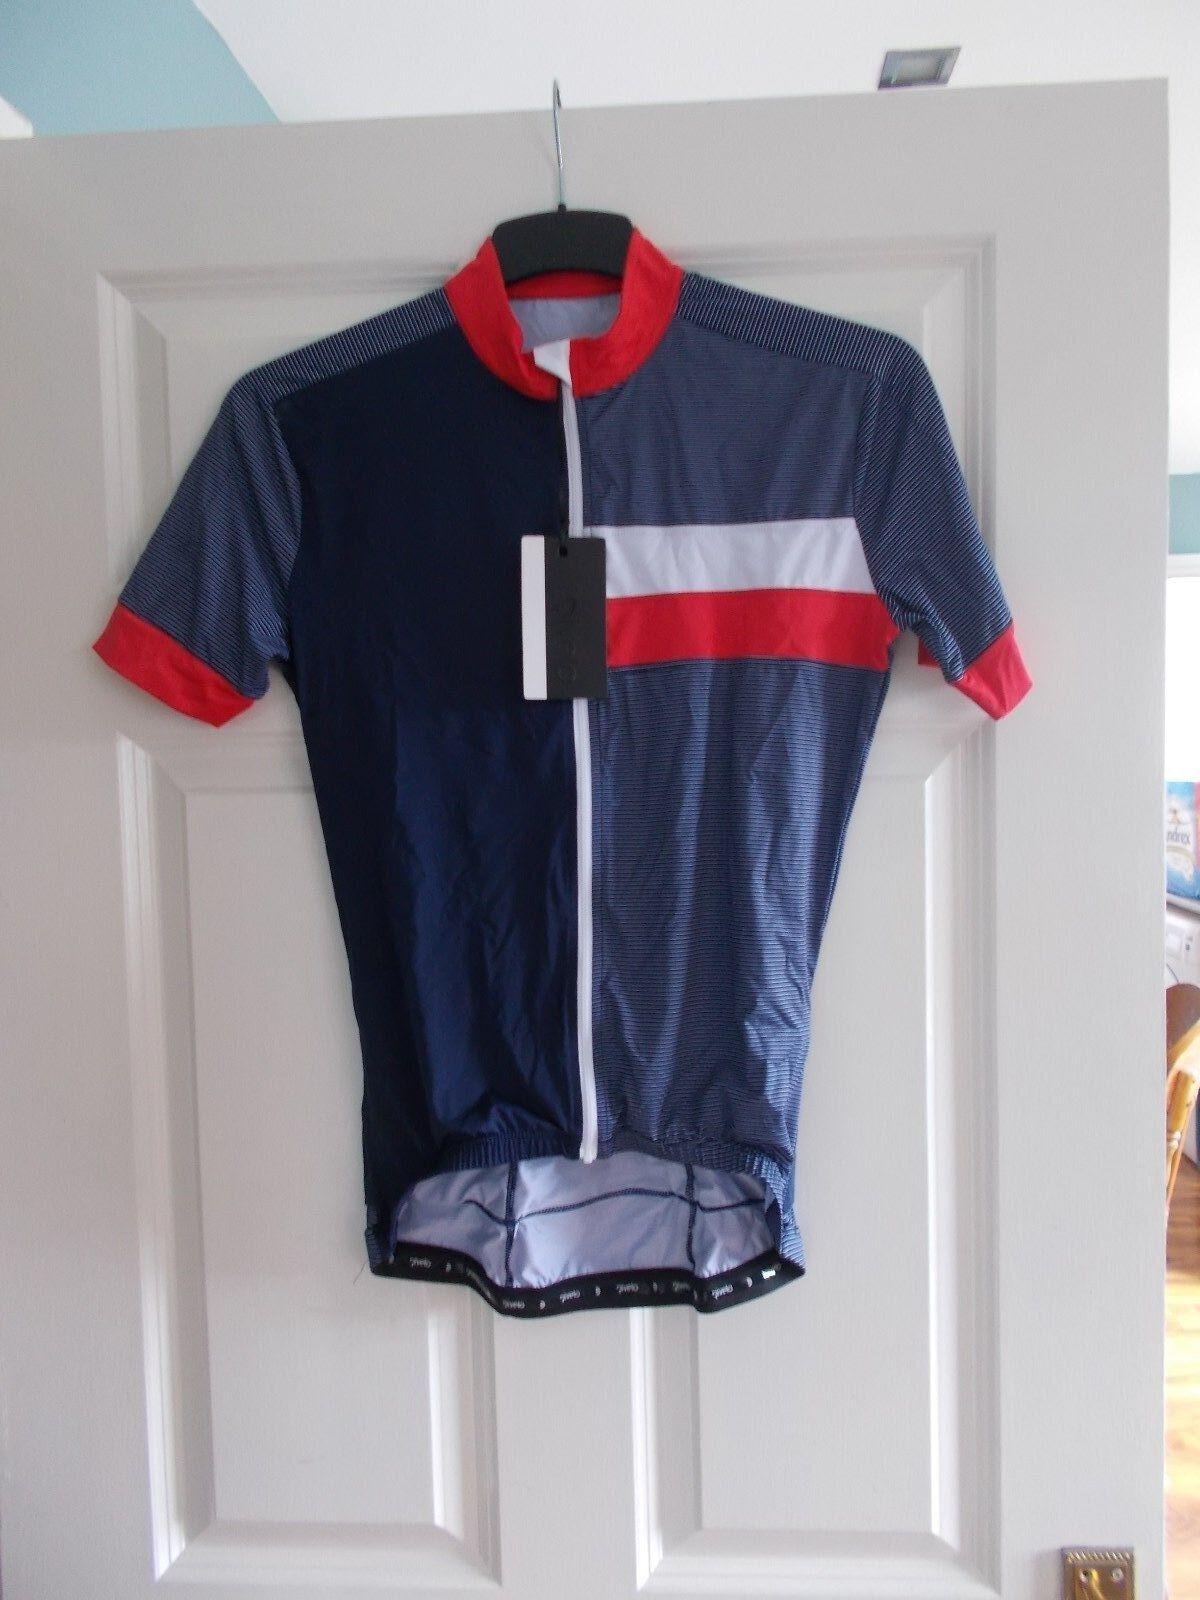 New Rivelo Herren Peaslake Short Sleeve Zipped Radfahren Jersey, Navy rot, Größe S